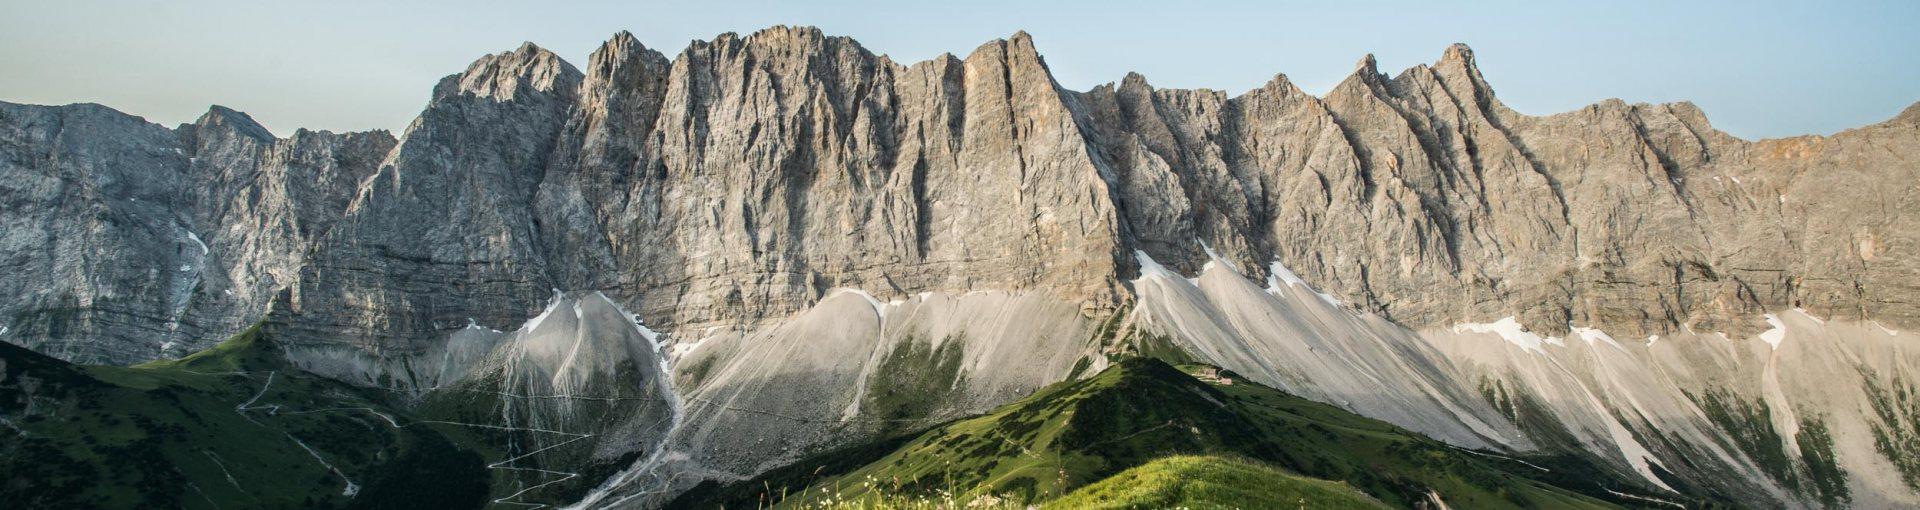 Bergsilhouette © Heinz Zak